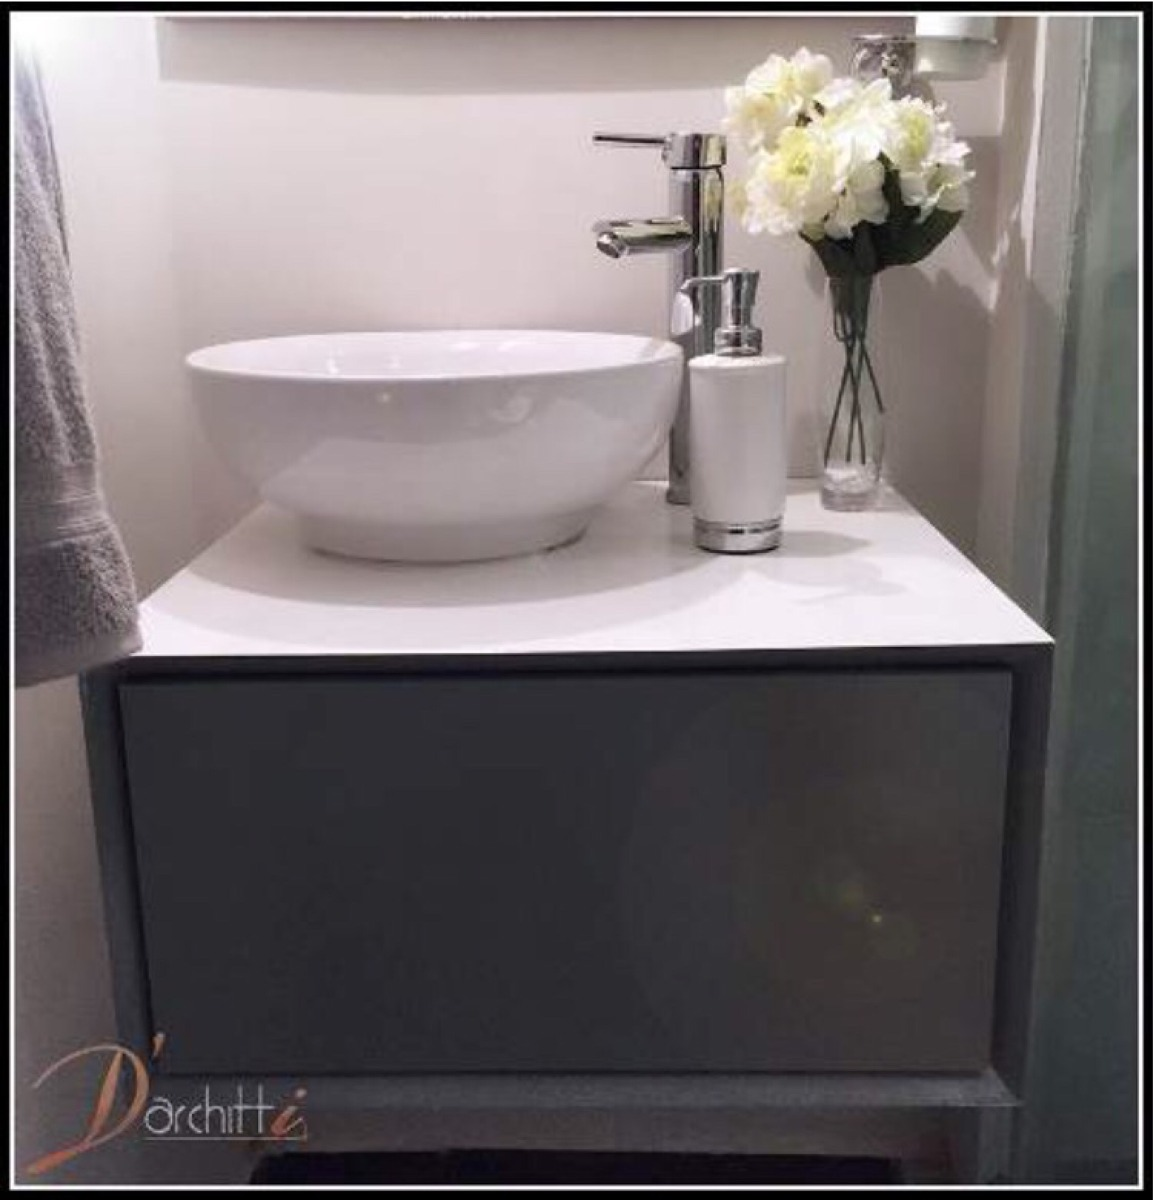 Ovalin Mueble Para Baño:Mueble De Baño Empotrar Minimalista Moderno Ovalin Monomando – $